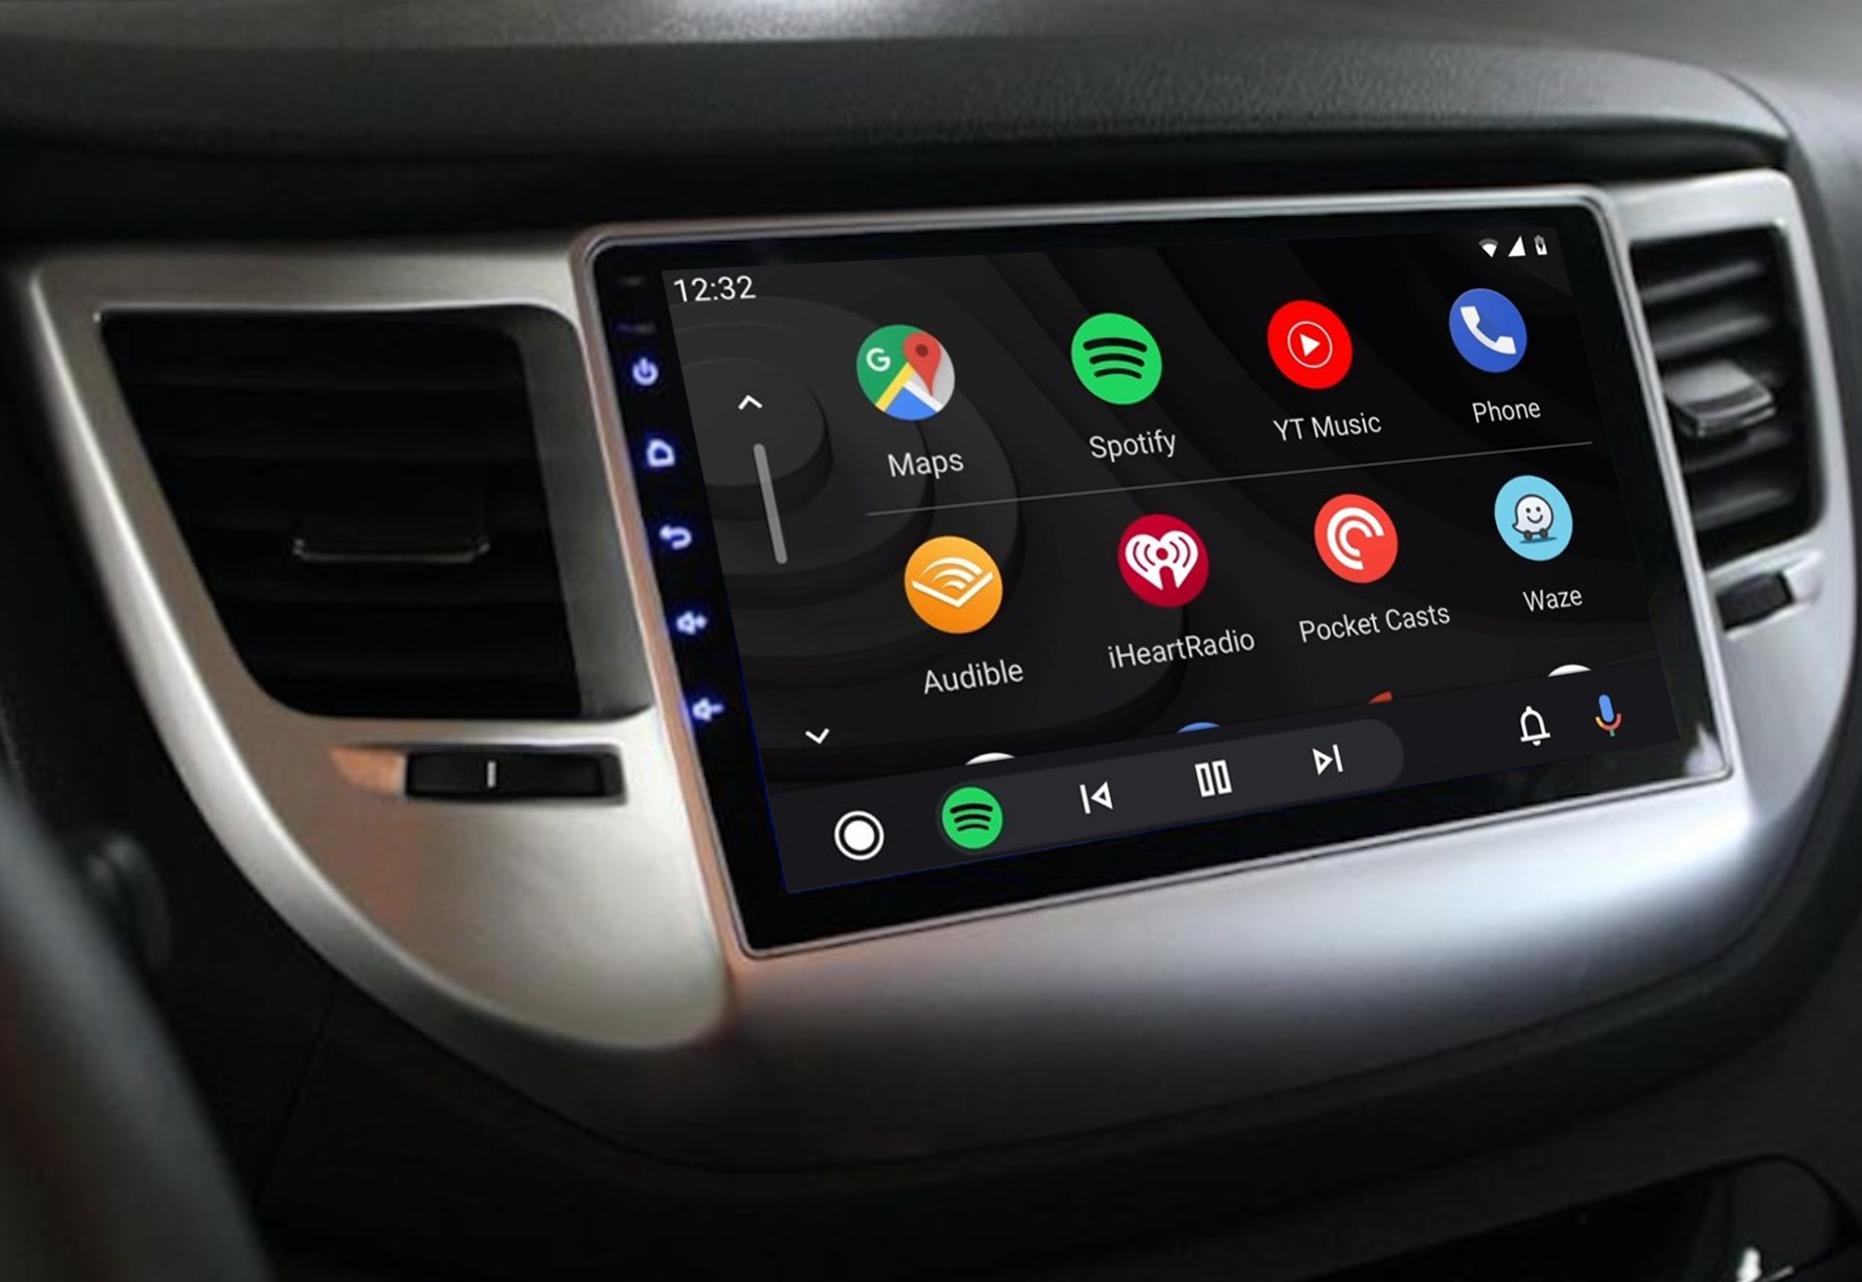 Ecran tactile QLED Android 11.0 + Apple Carplay sans fil Hyundai Tucson de 2015 à 2018